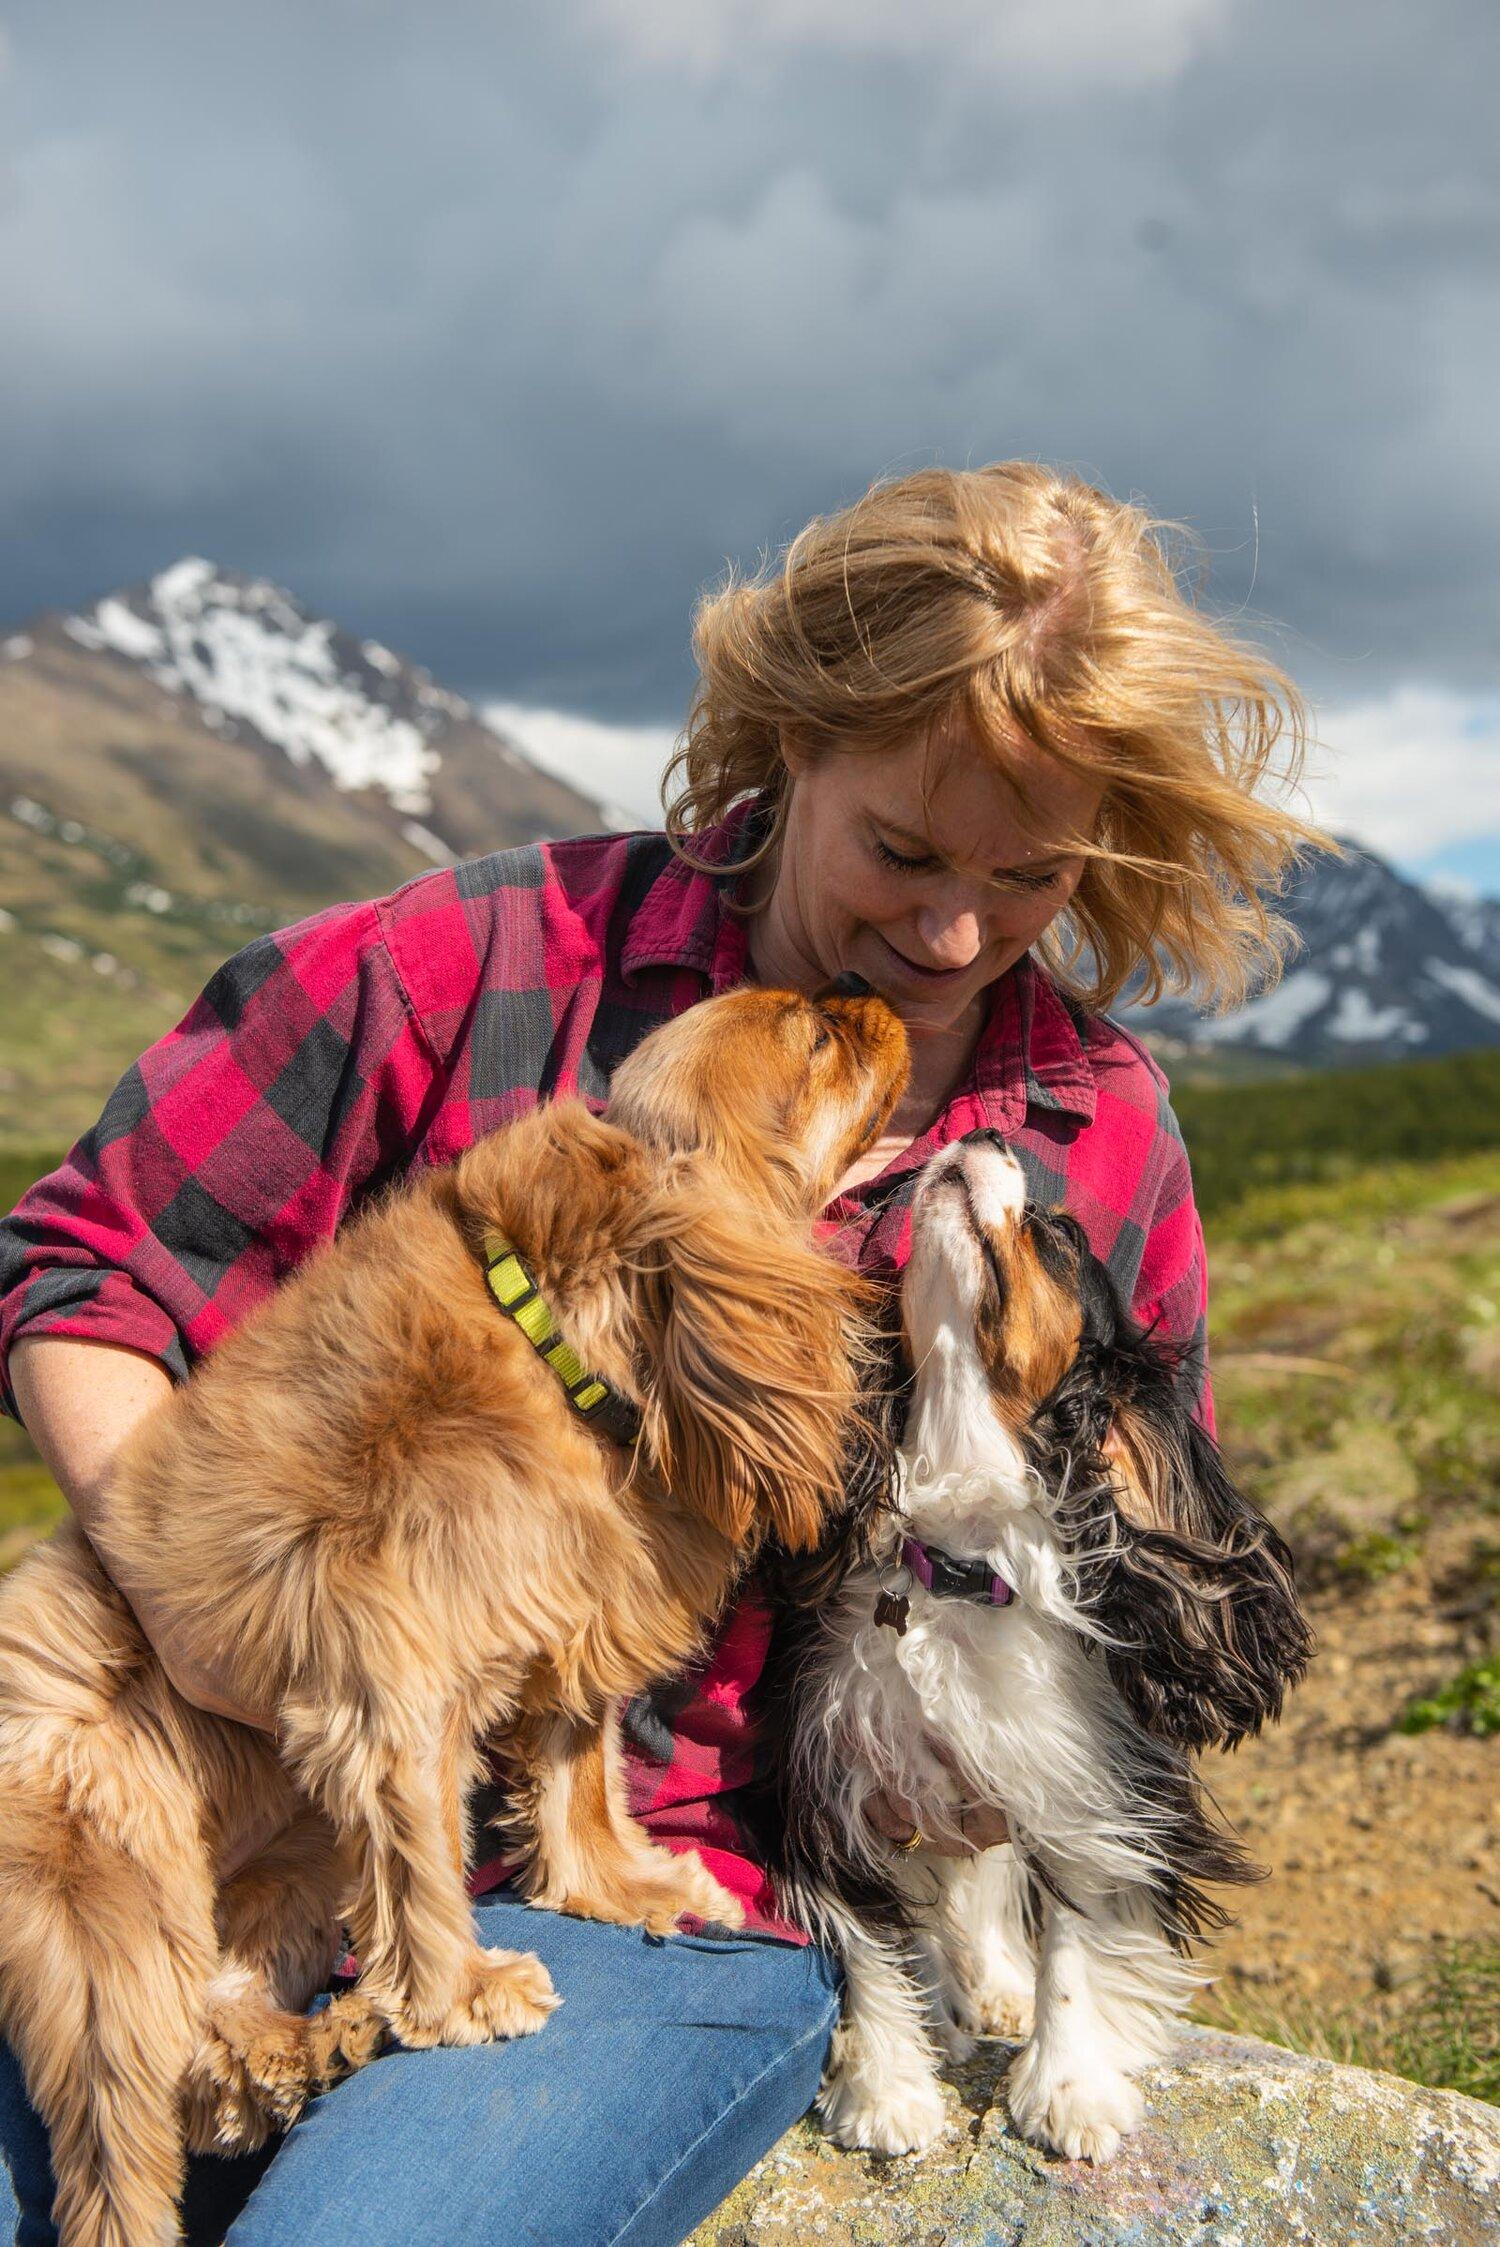 Meredith Berg Photography Anchorage Alaska Dog Pet Photographer Ali and Harmony Cavalier King Charles Spaniel_DSC6612.jpg